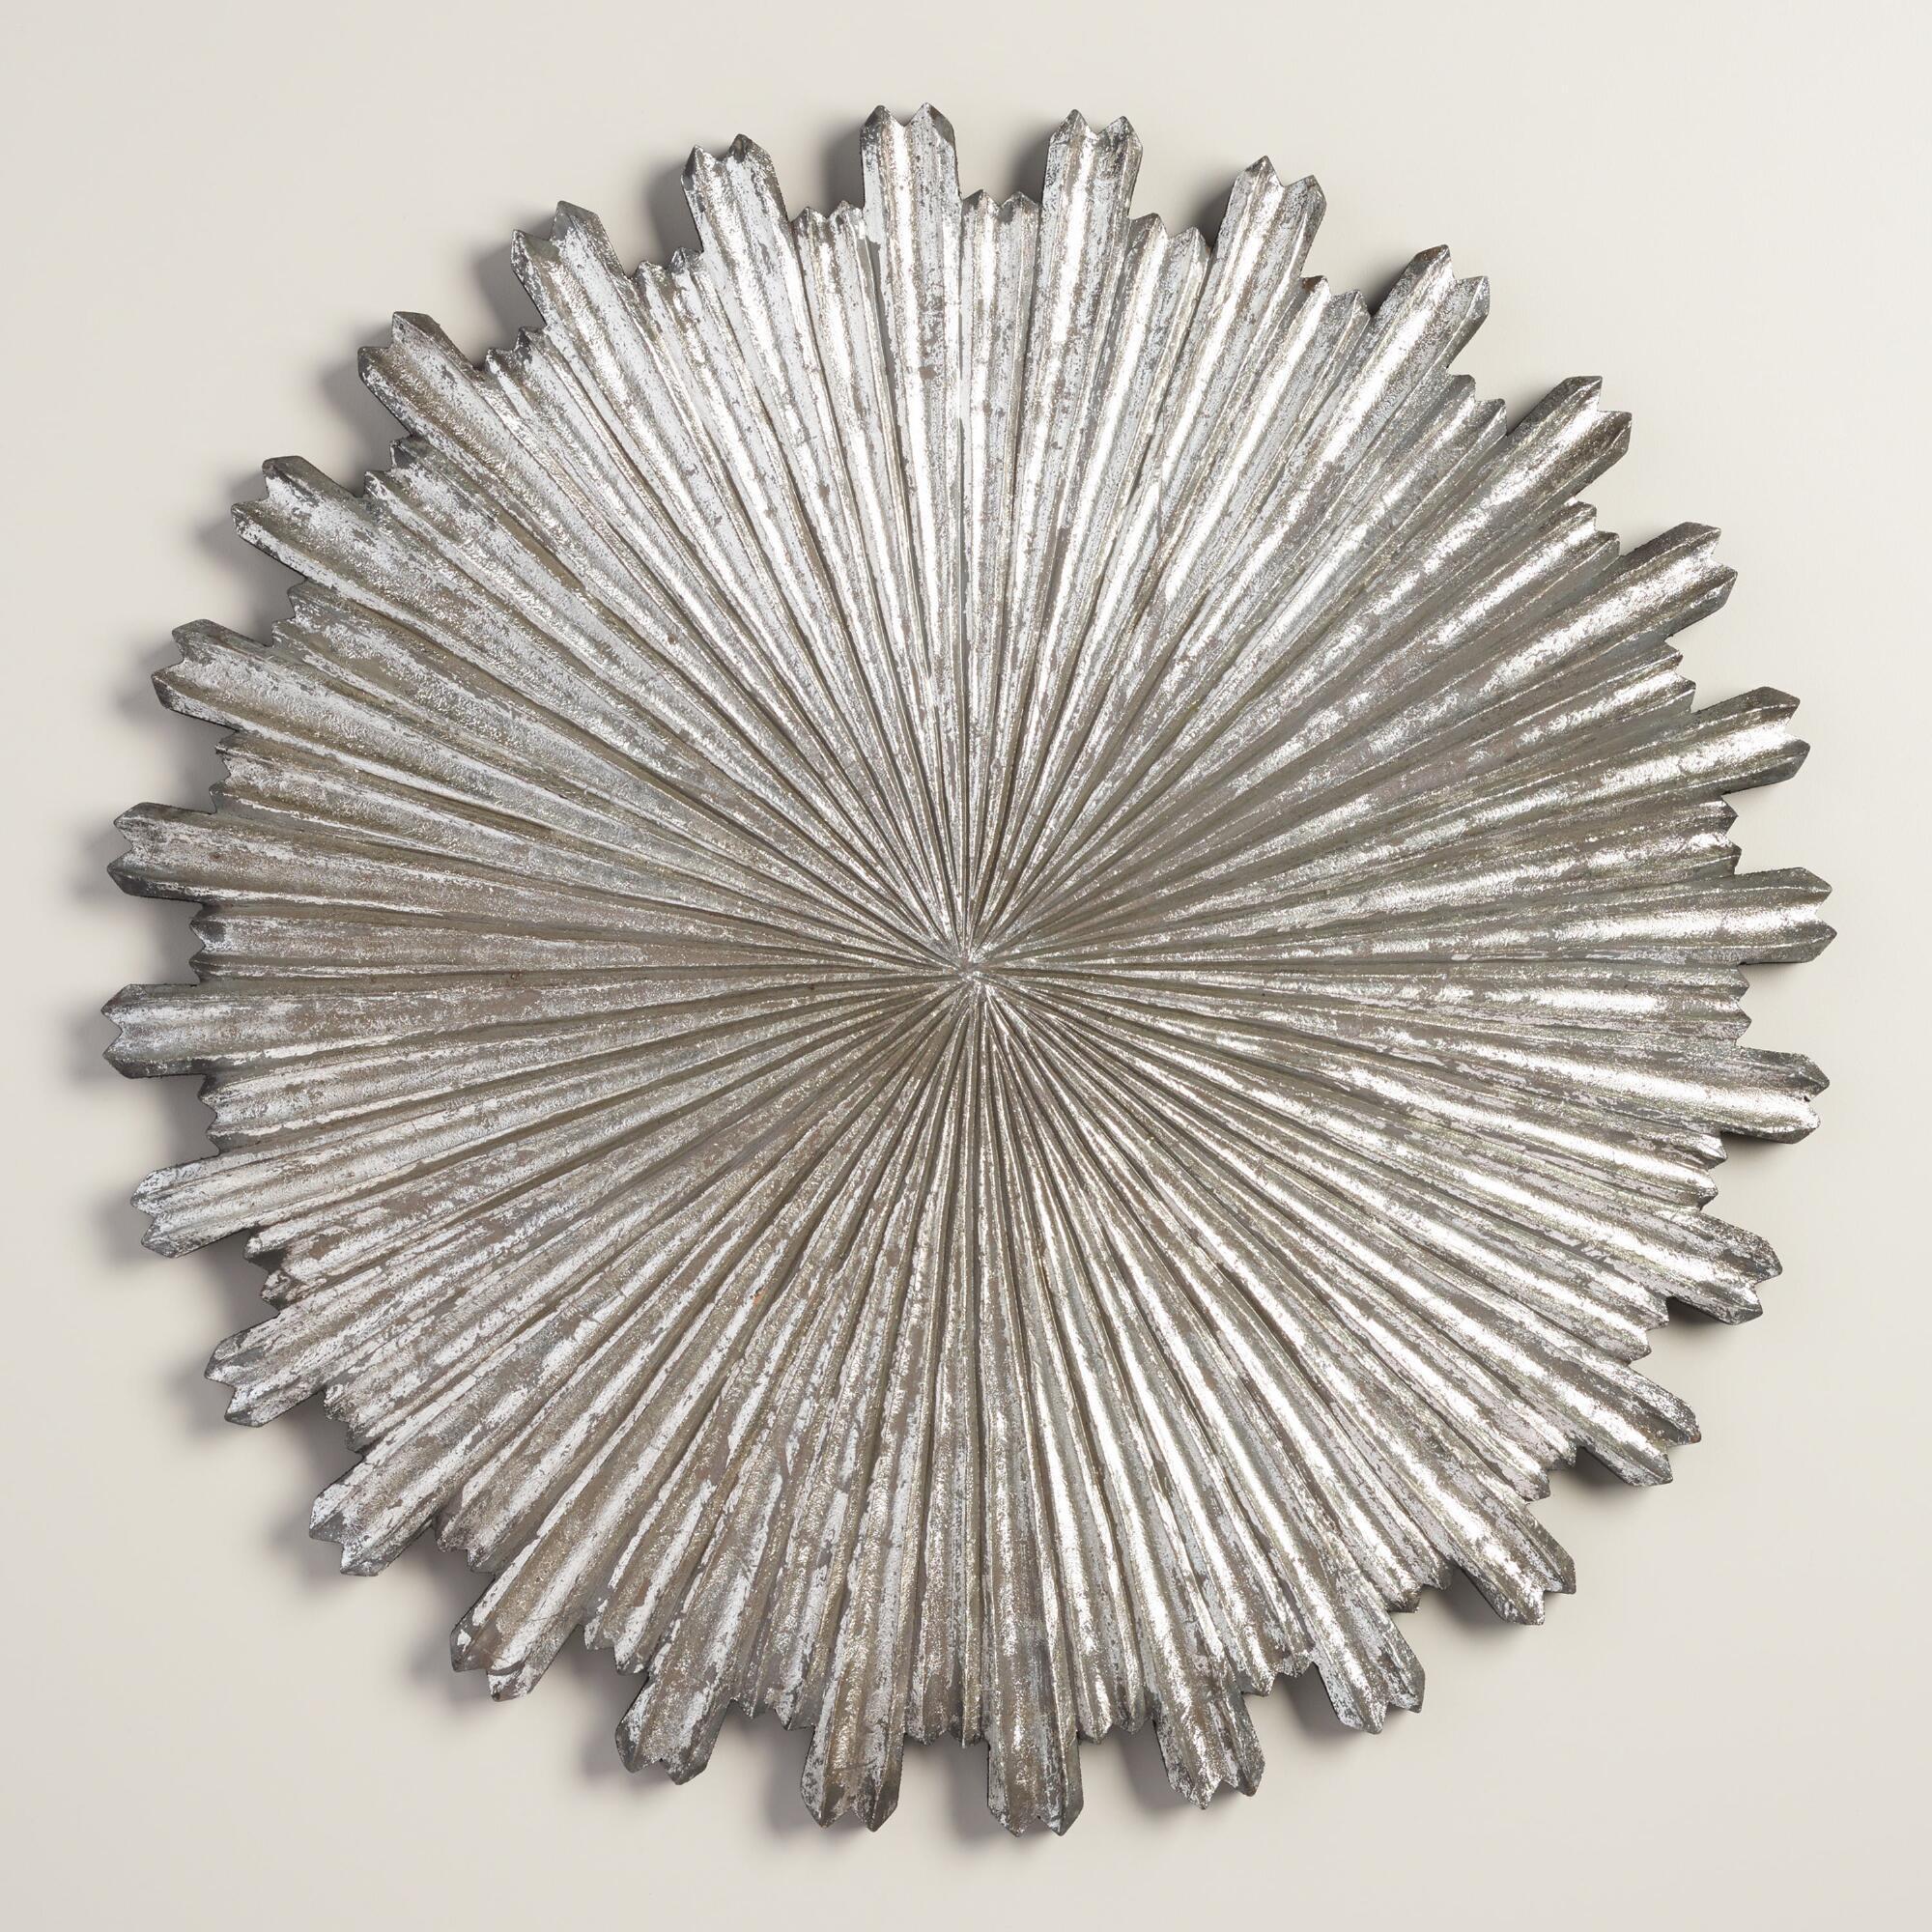 Wall Art Designs: Sunburst Wall Art Silver Wall Decor On Metal Inside Metal Medallion Wall Art (View 13 of 20)